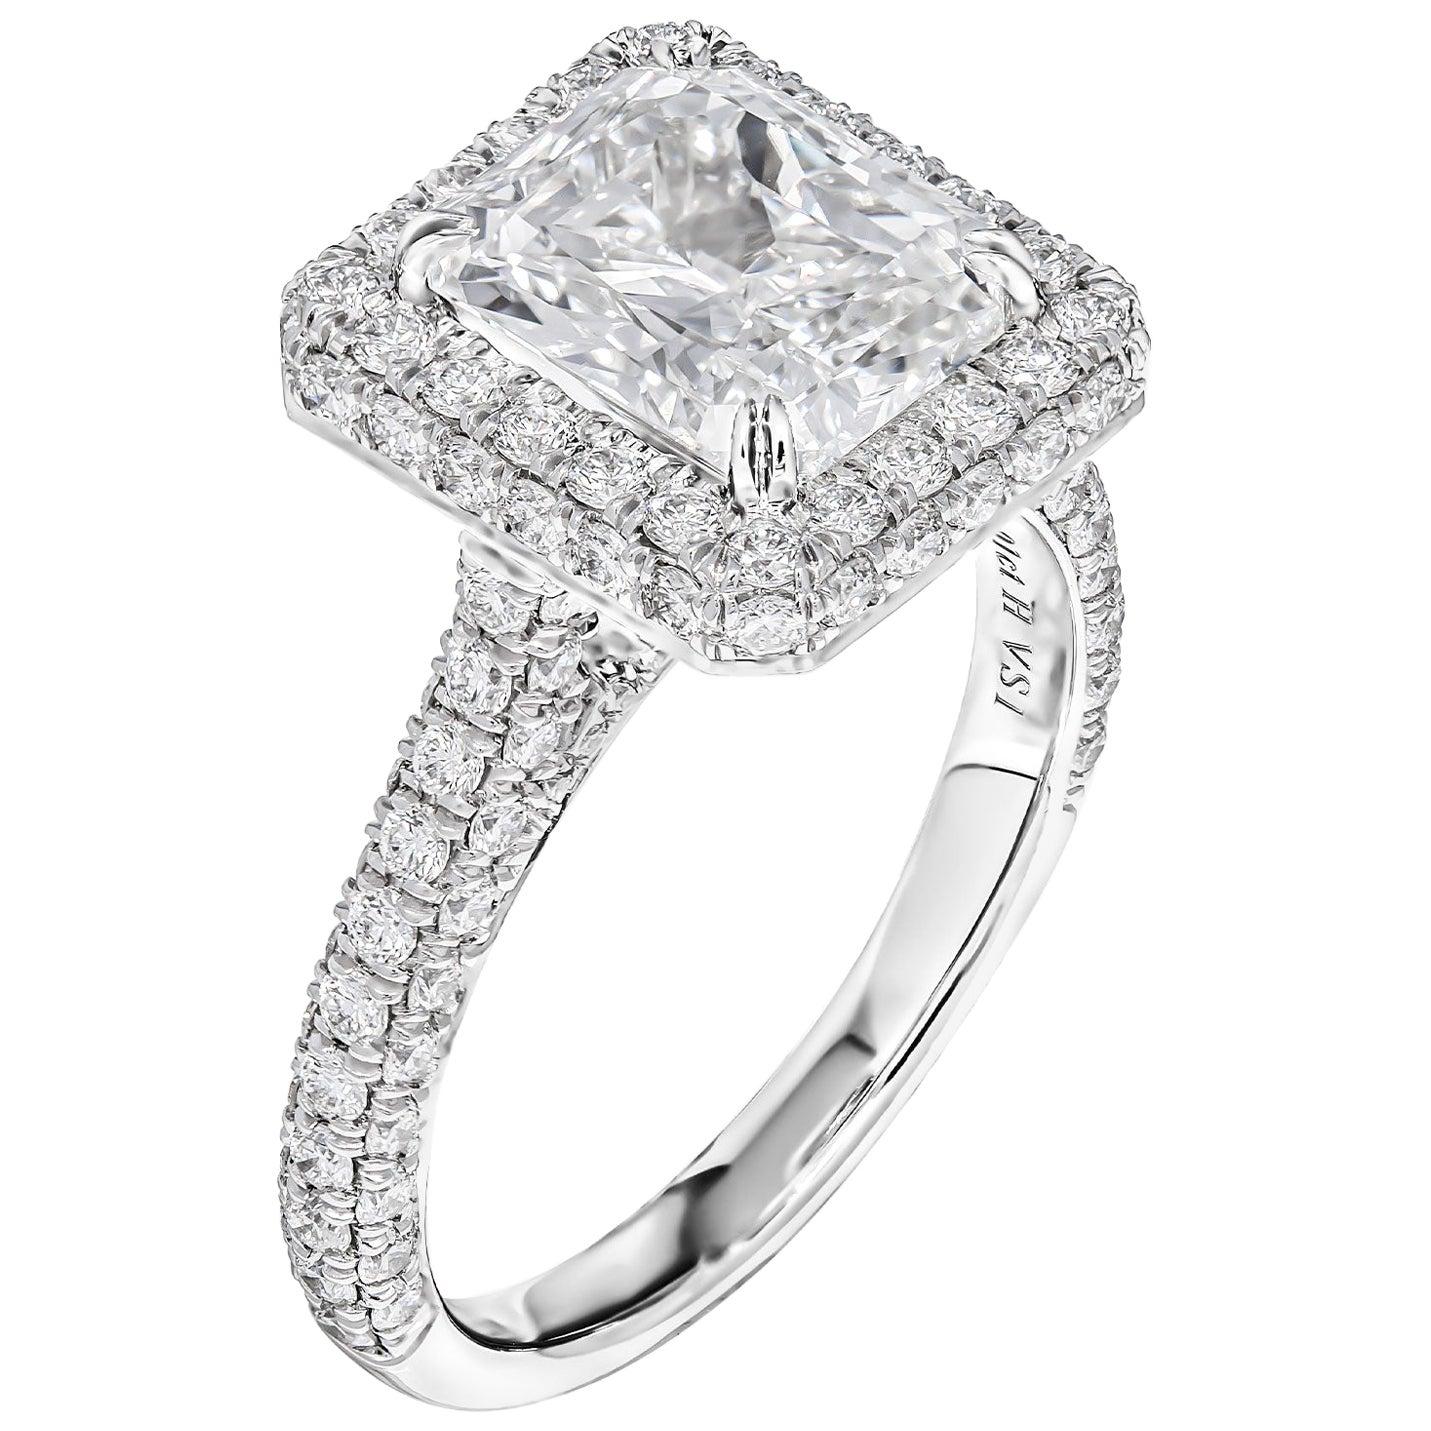 GIA Certified Platinum Ring with 3.01 Carat Radiant Cut Diamond